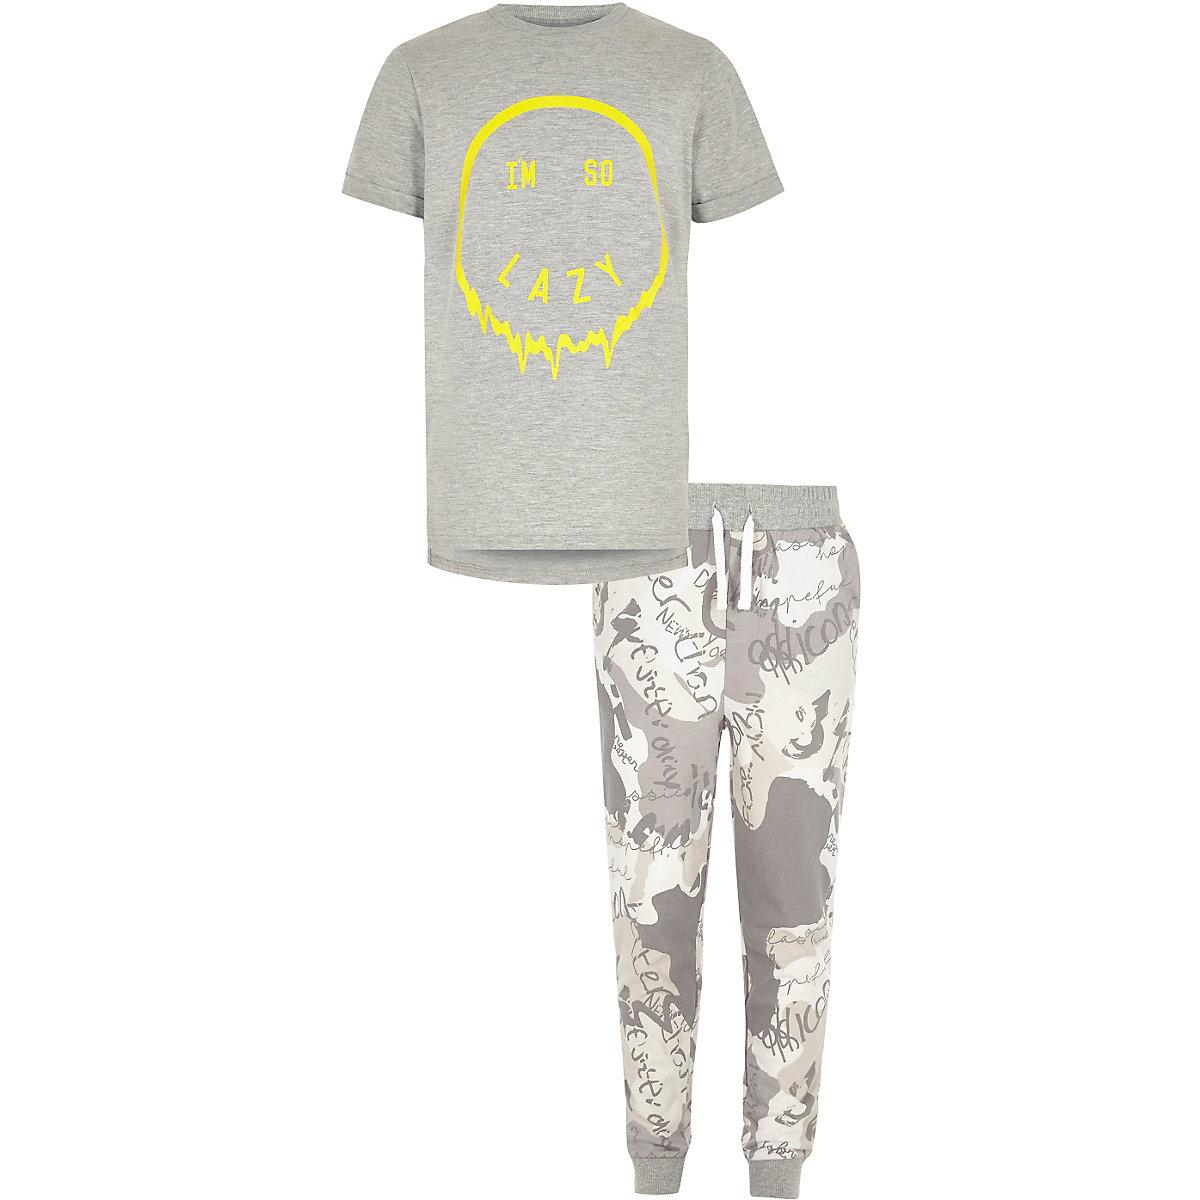 Ensemble de pyjama «I'm so lazy» gris pour garçon